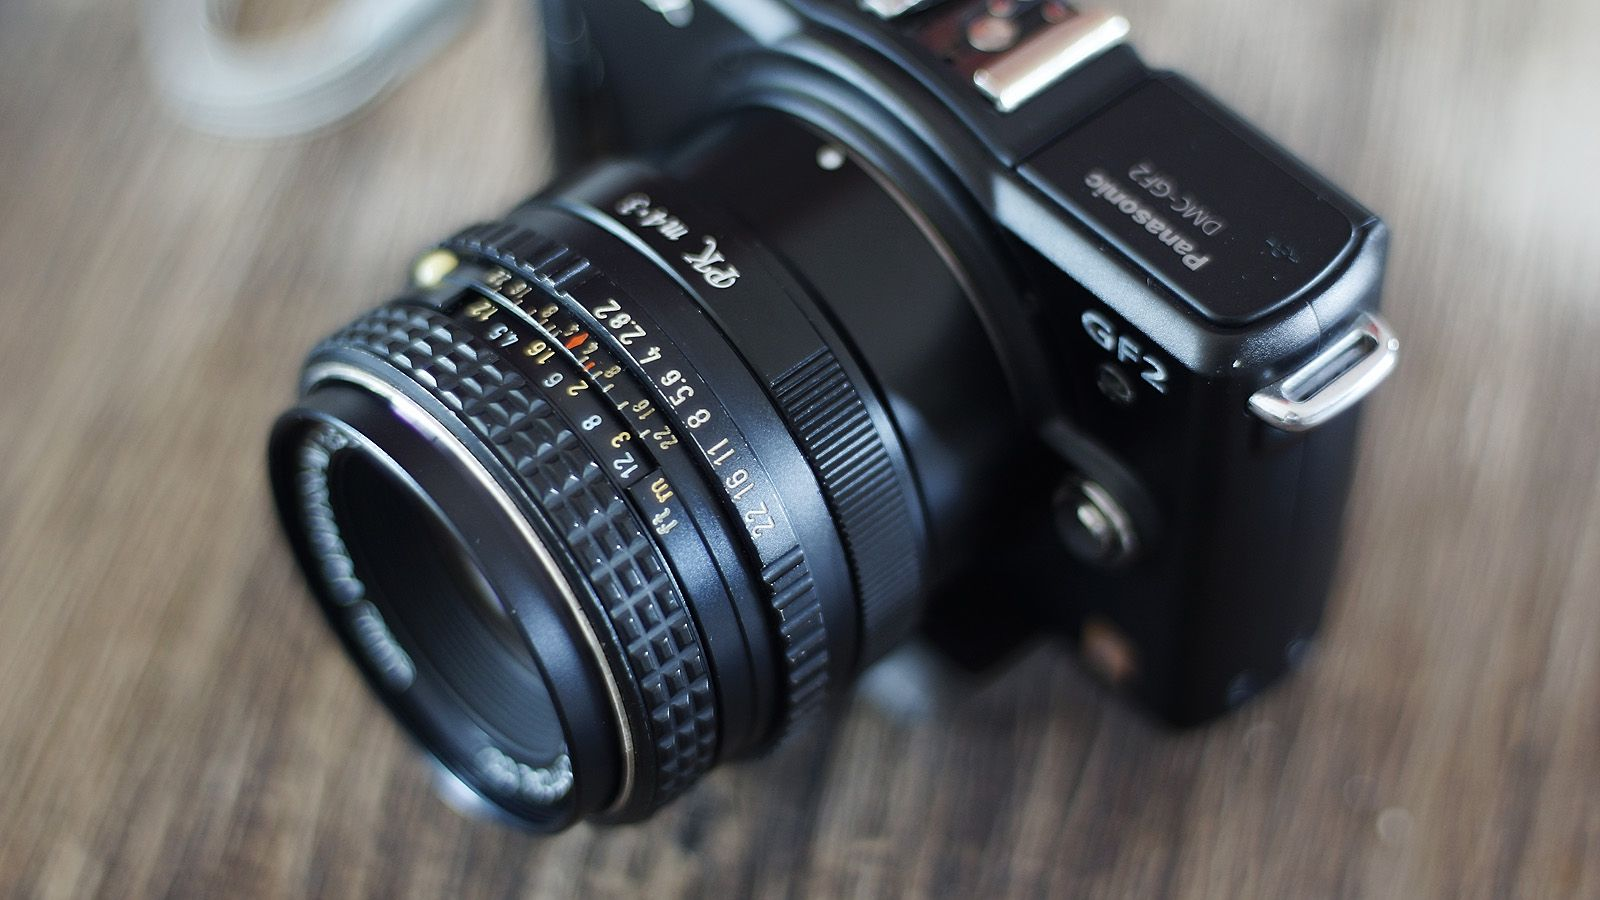 Lumix Gf2 Smc Pentax M 50mm F 2 Pentax Binoculars Photography